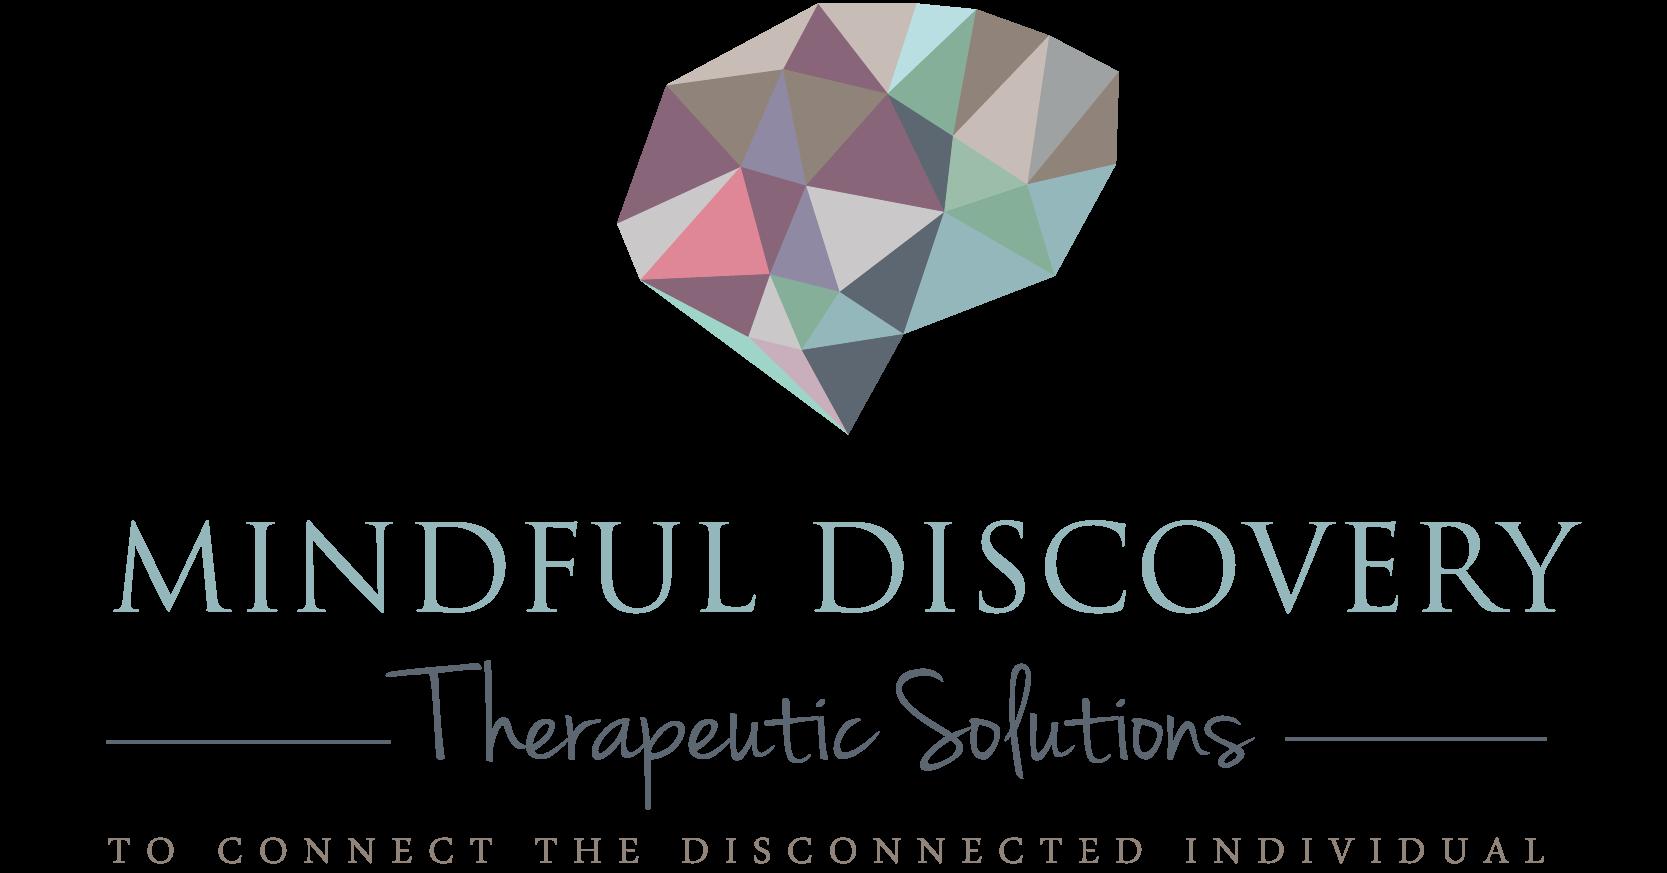 https://secureservercdn.net/198.71.233.141/iwx.dda.myftpupload.com/wp-content/uploads/2018/03/cropped-Mindful-Discovery-Final-Logo-01.png